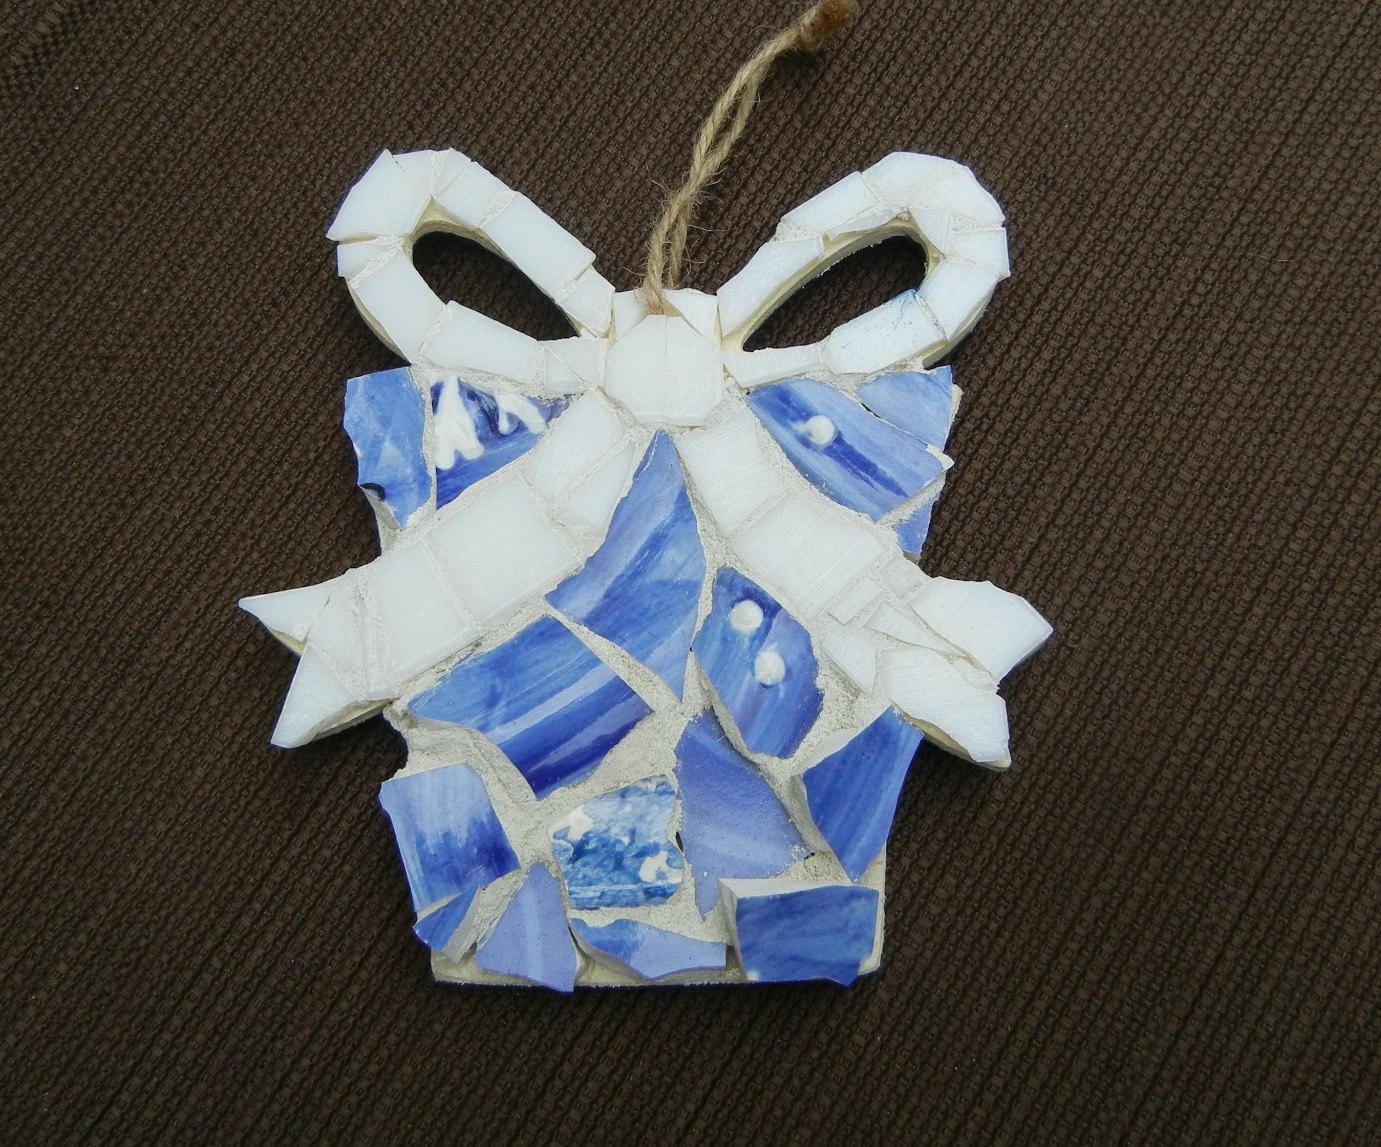 Christmas ornament mosaic gift box